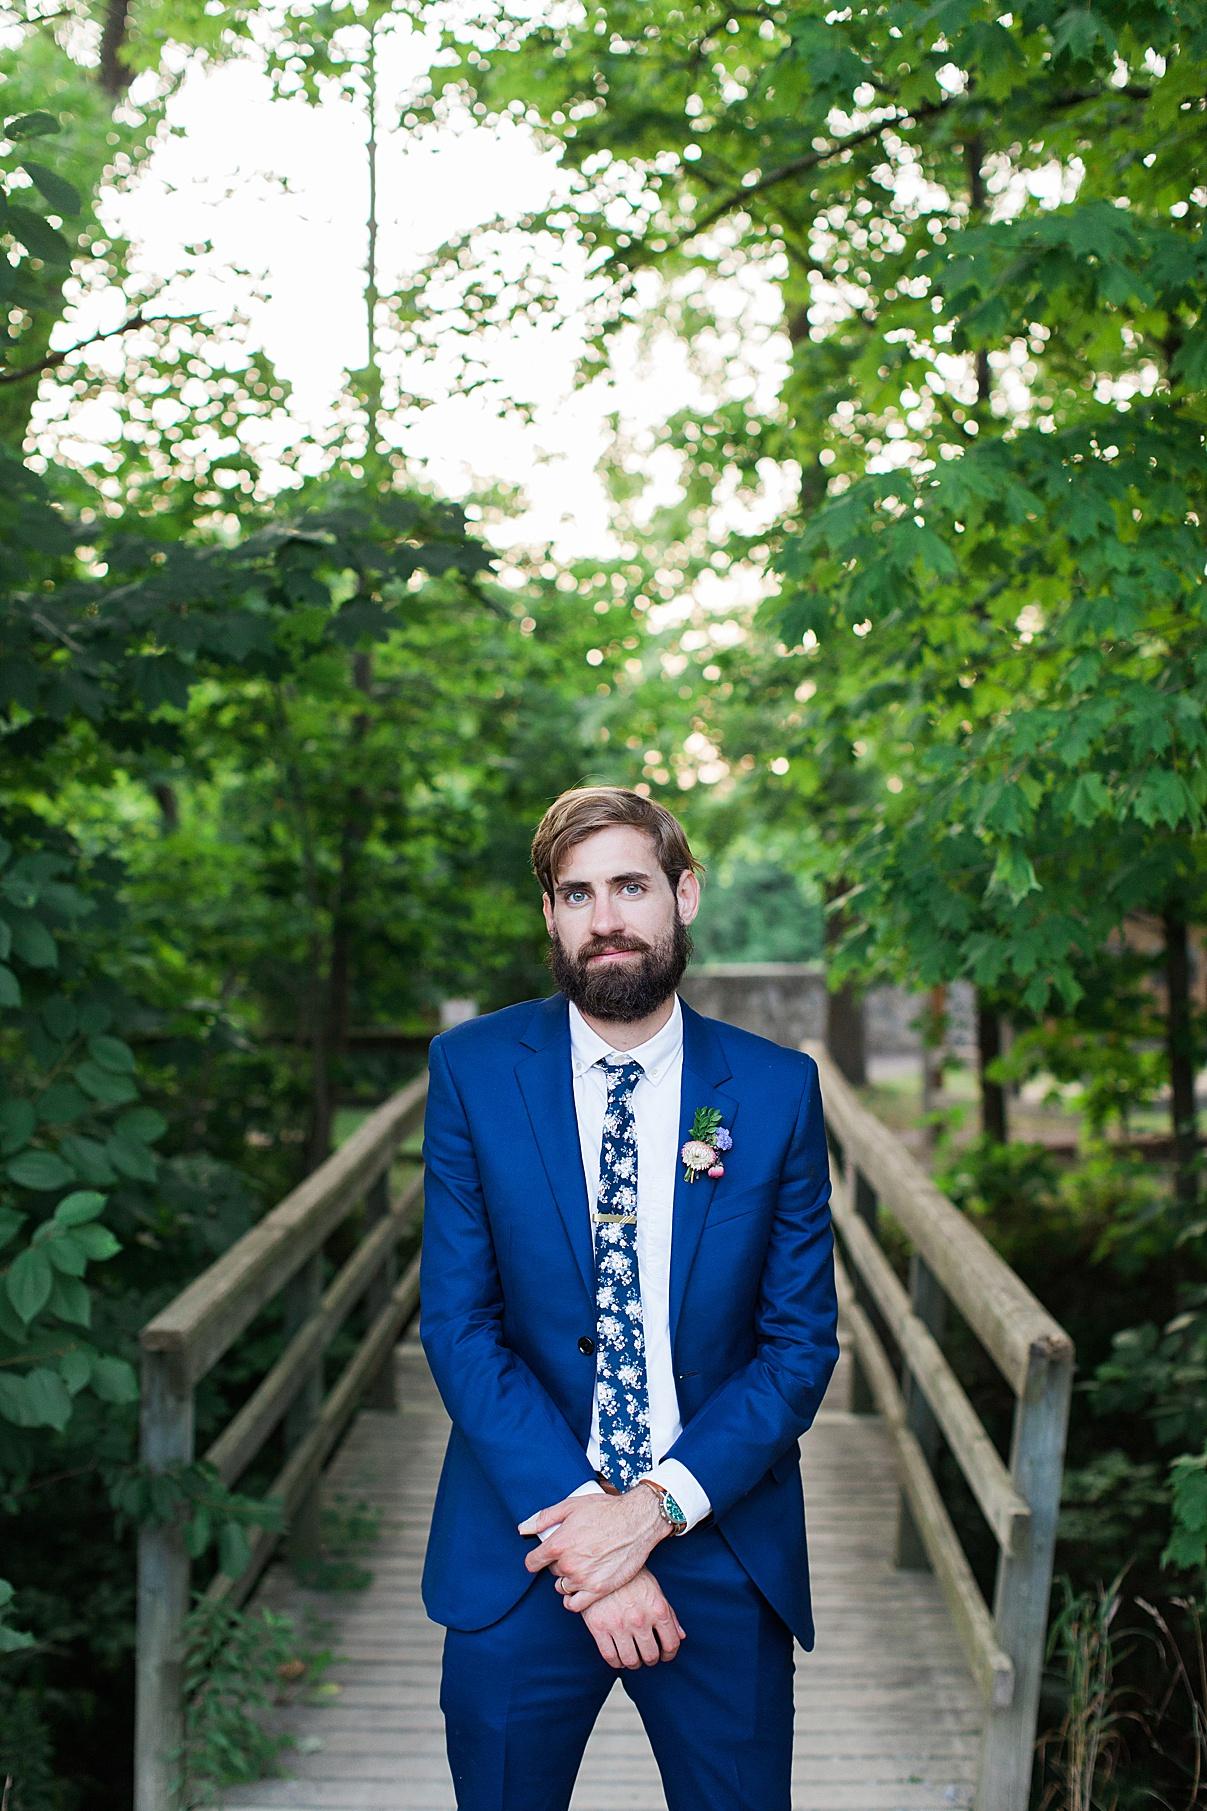 Groom portrait| Balls Falls, Ontario Wedding| Ontario Wedding Photographer| Toronto Wedding Photographer| 3Photography| 3photography.ca